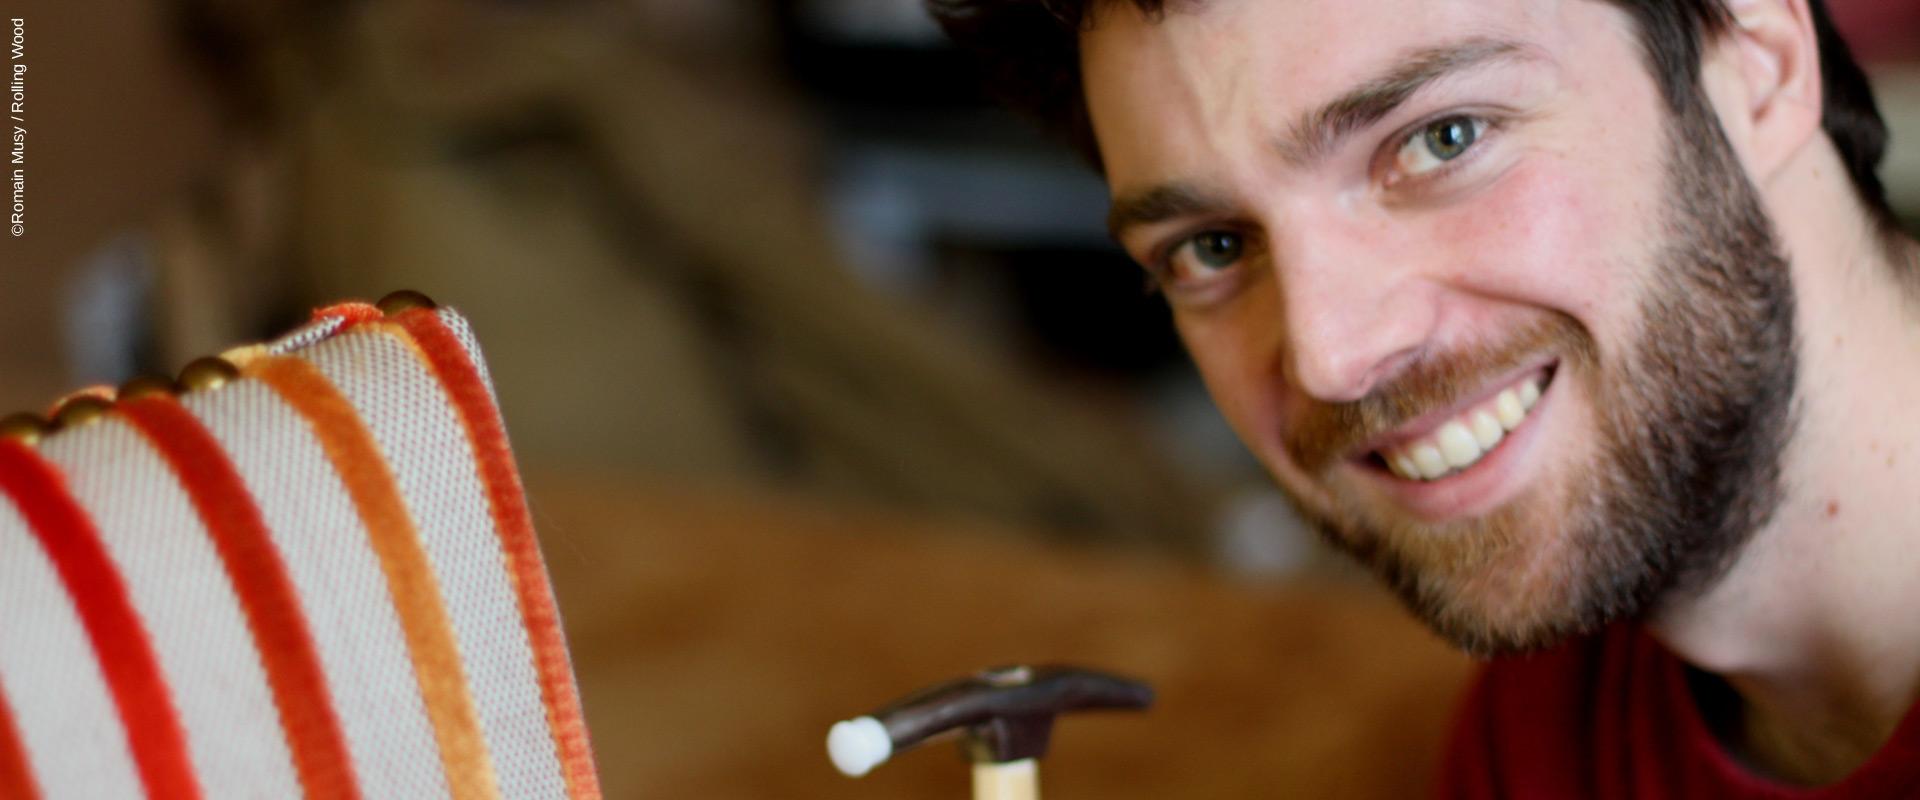 Romain Musy - tapissier - Graines de l'Ain